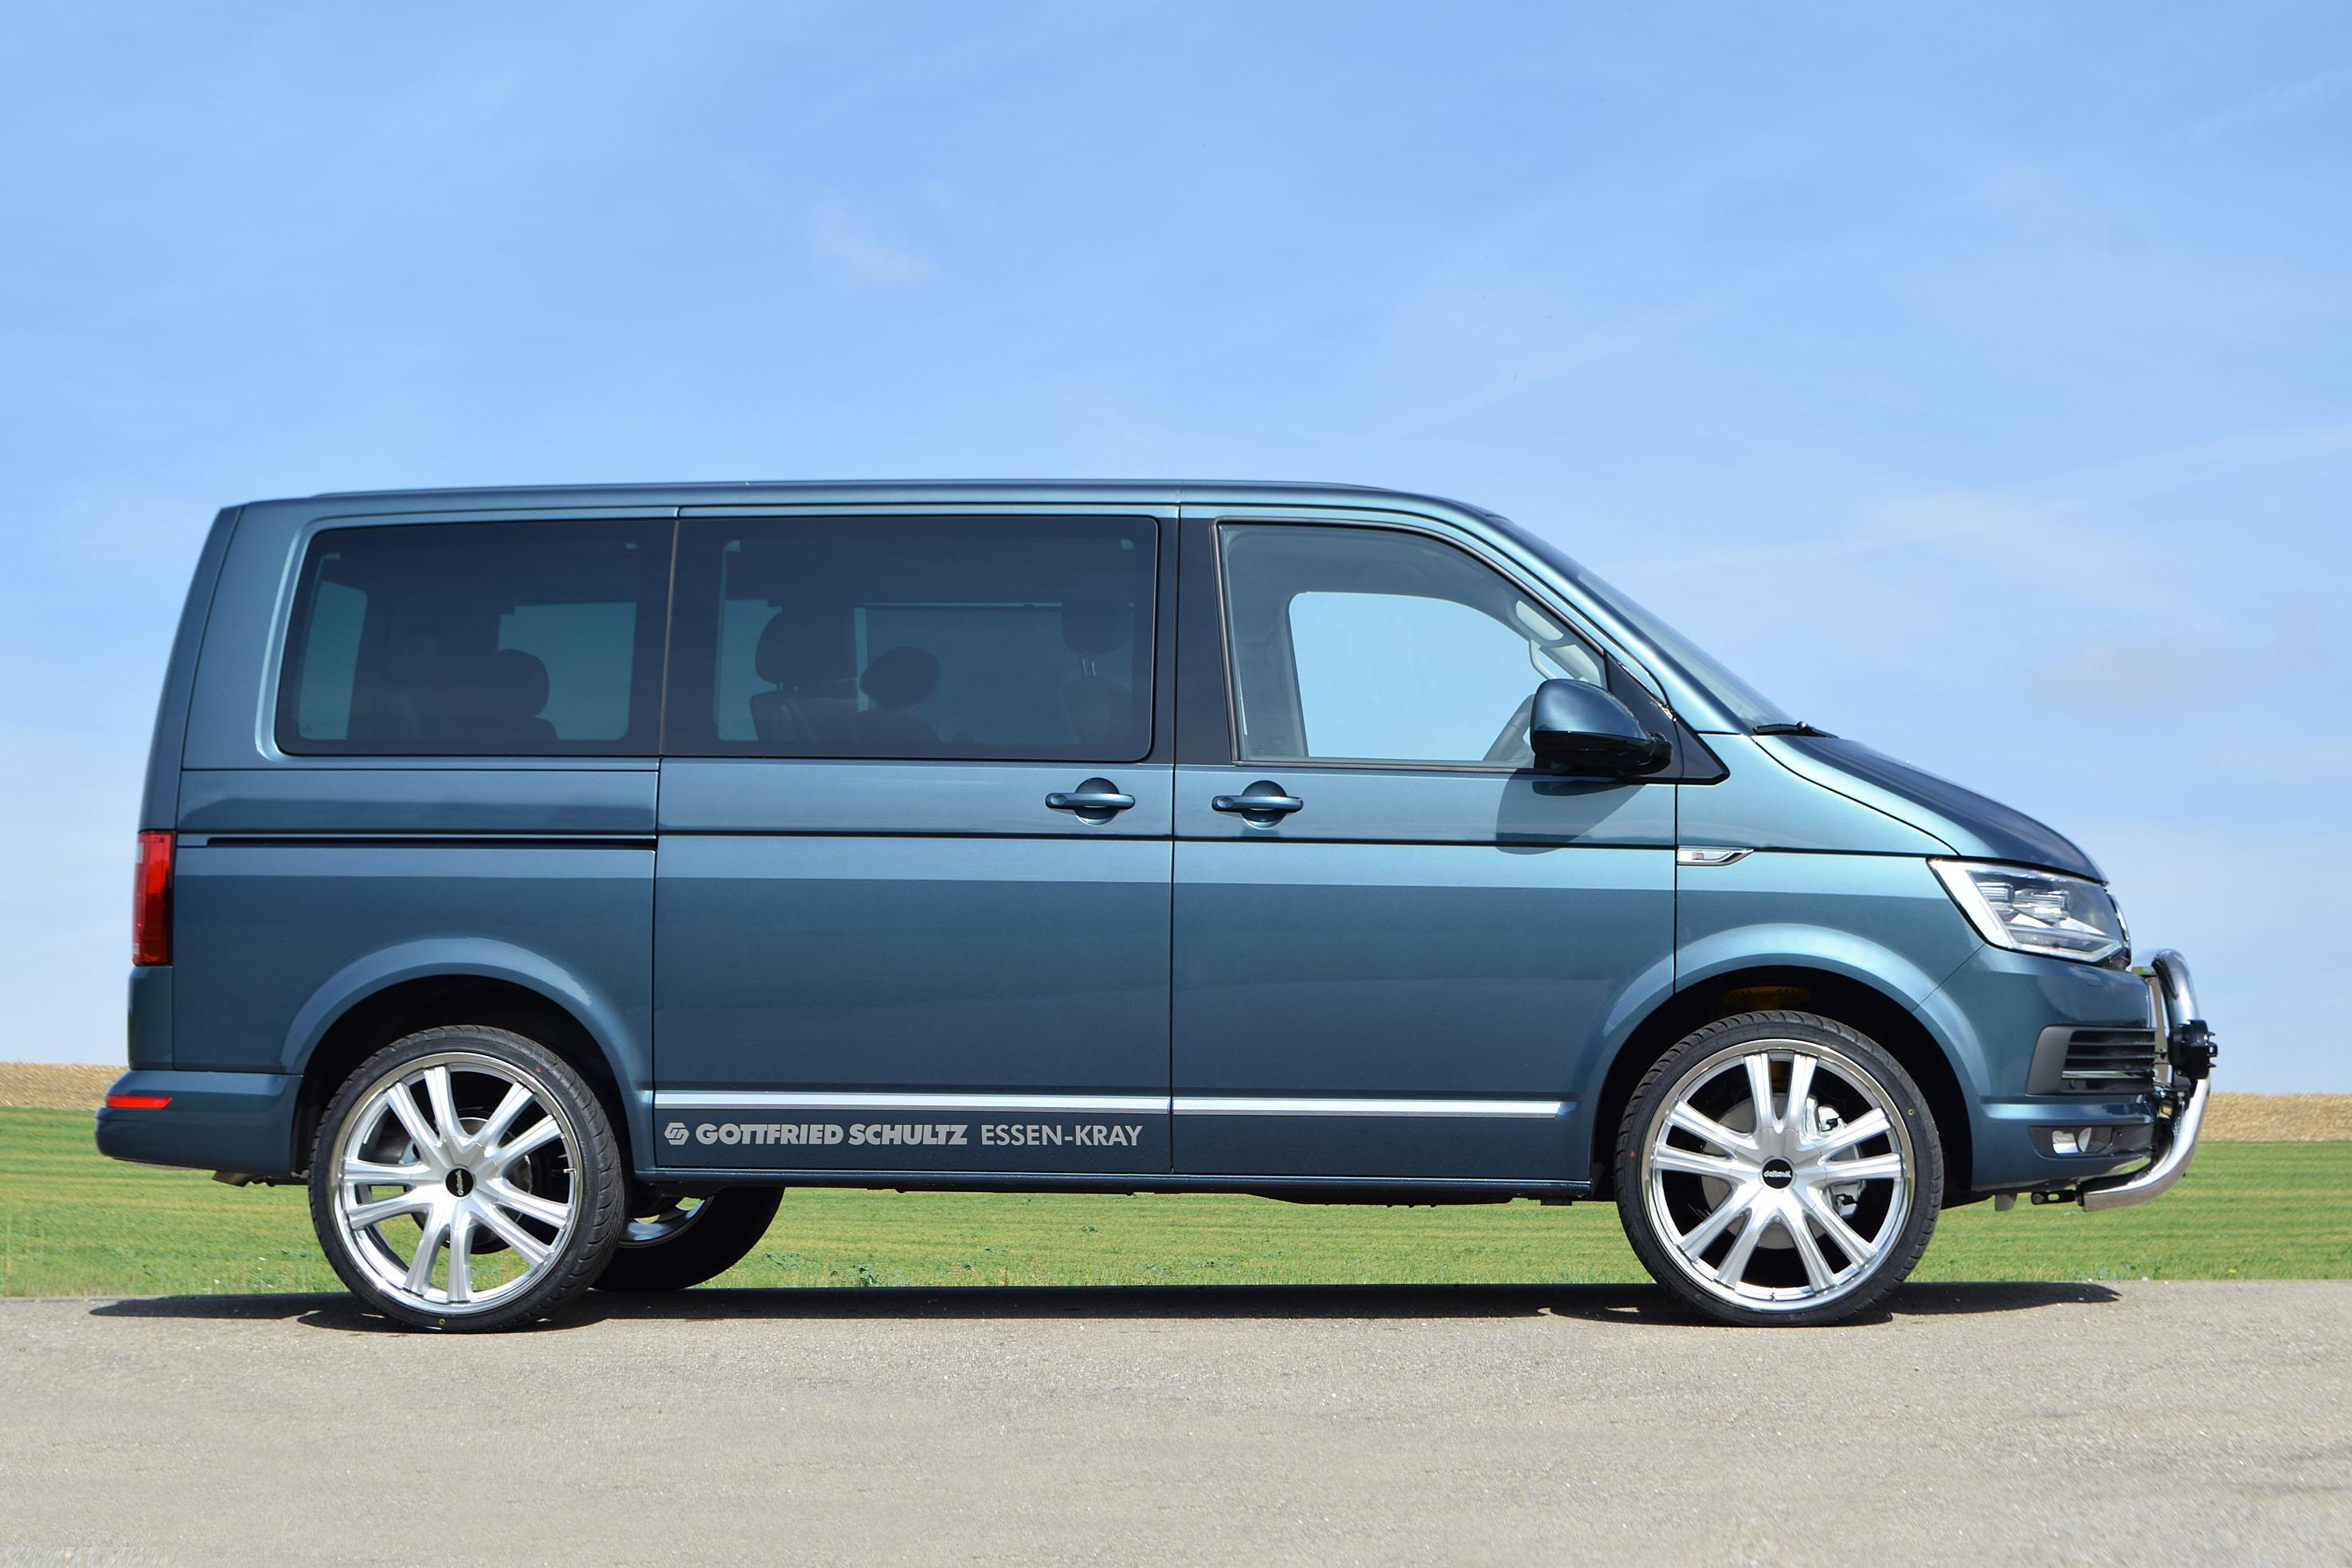 delta 4x4 announces off road package for vw multi van. Black Bedroom Furniture Sets. Home Design Ideas